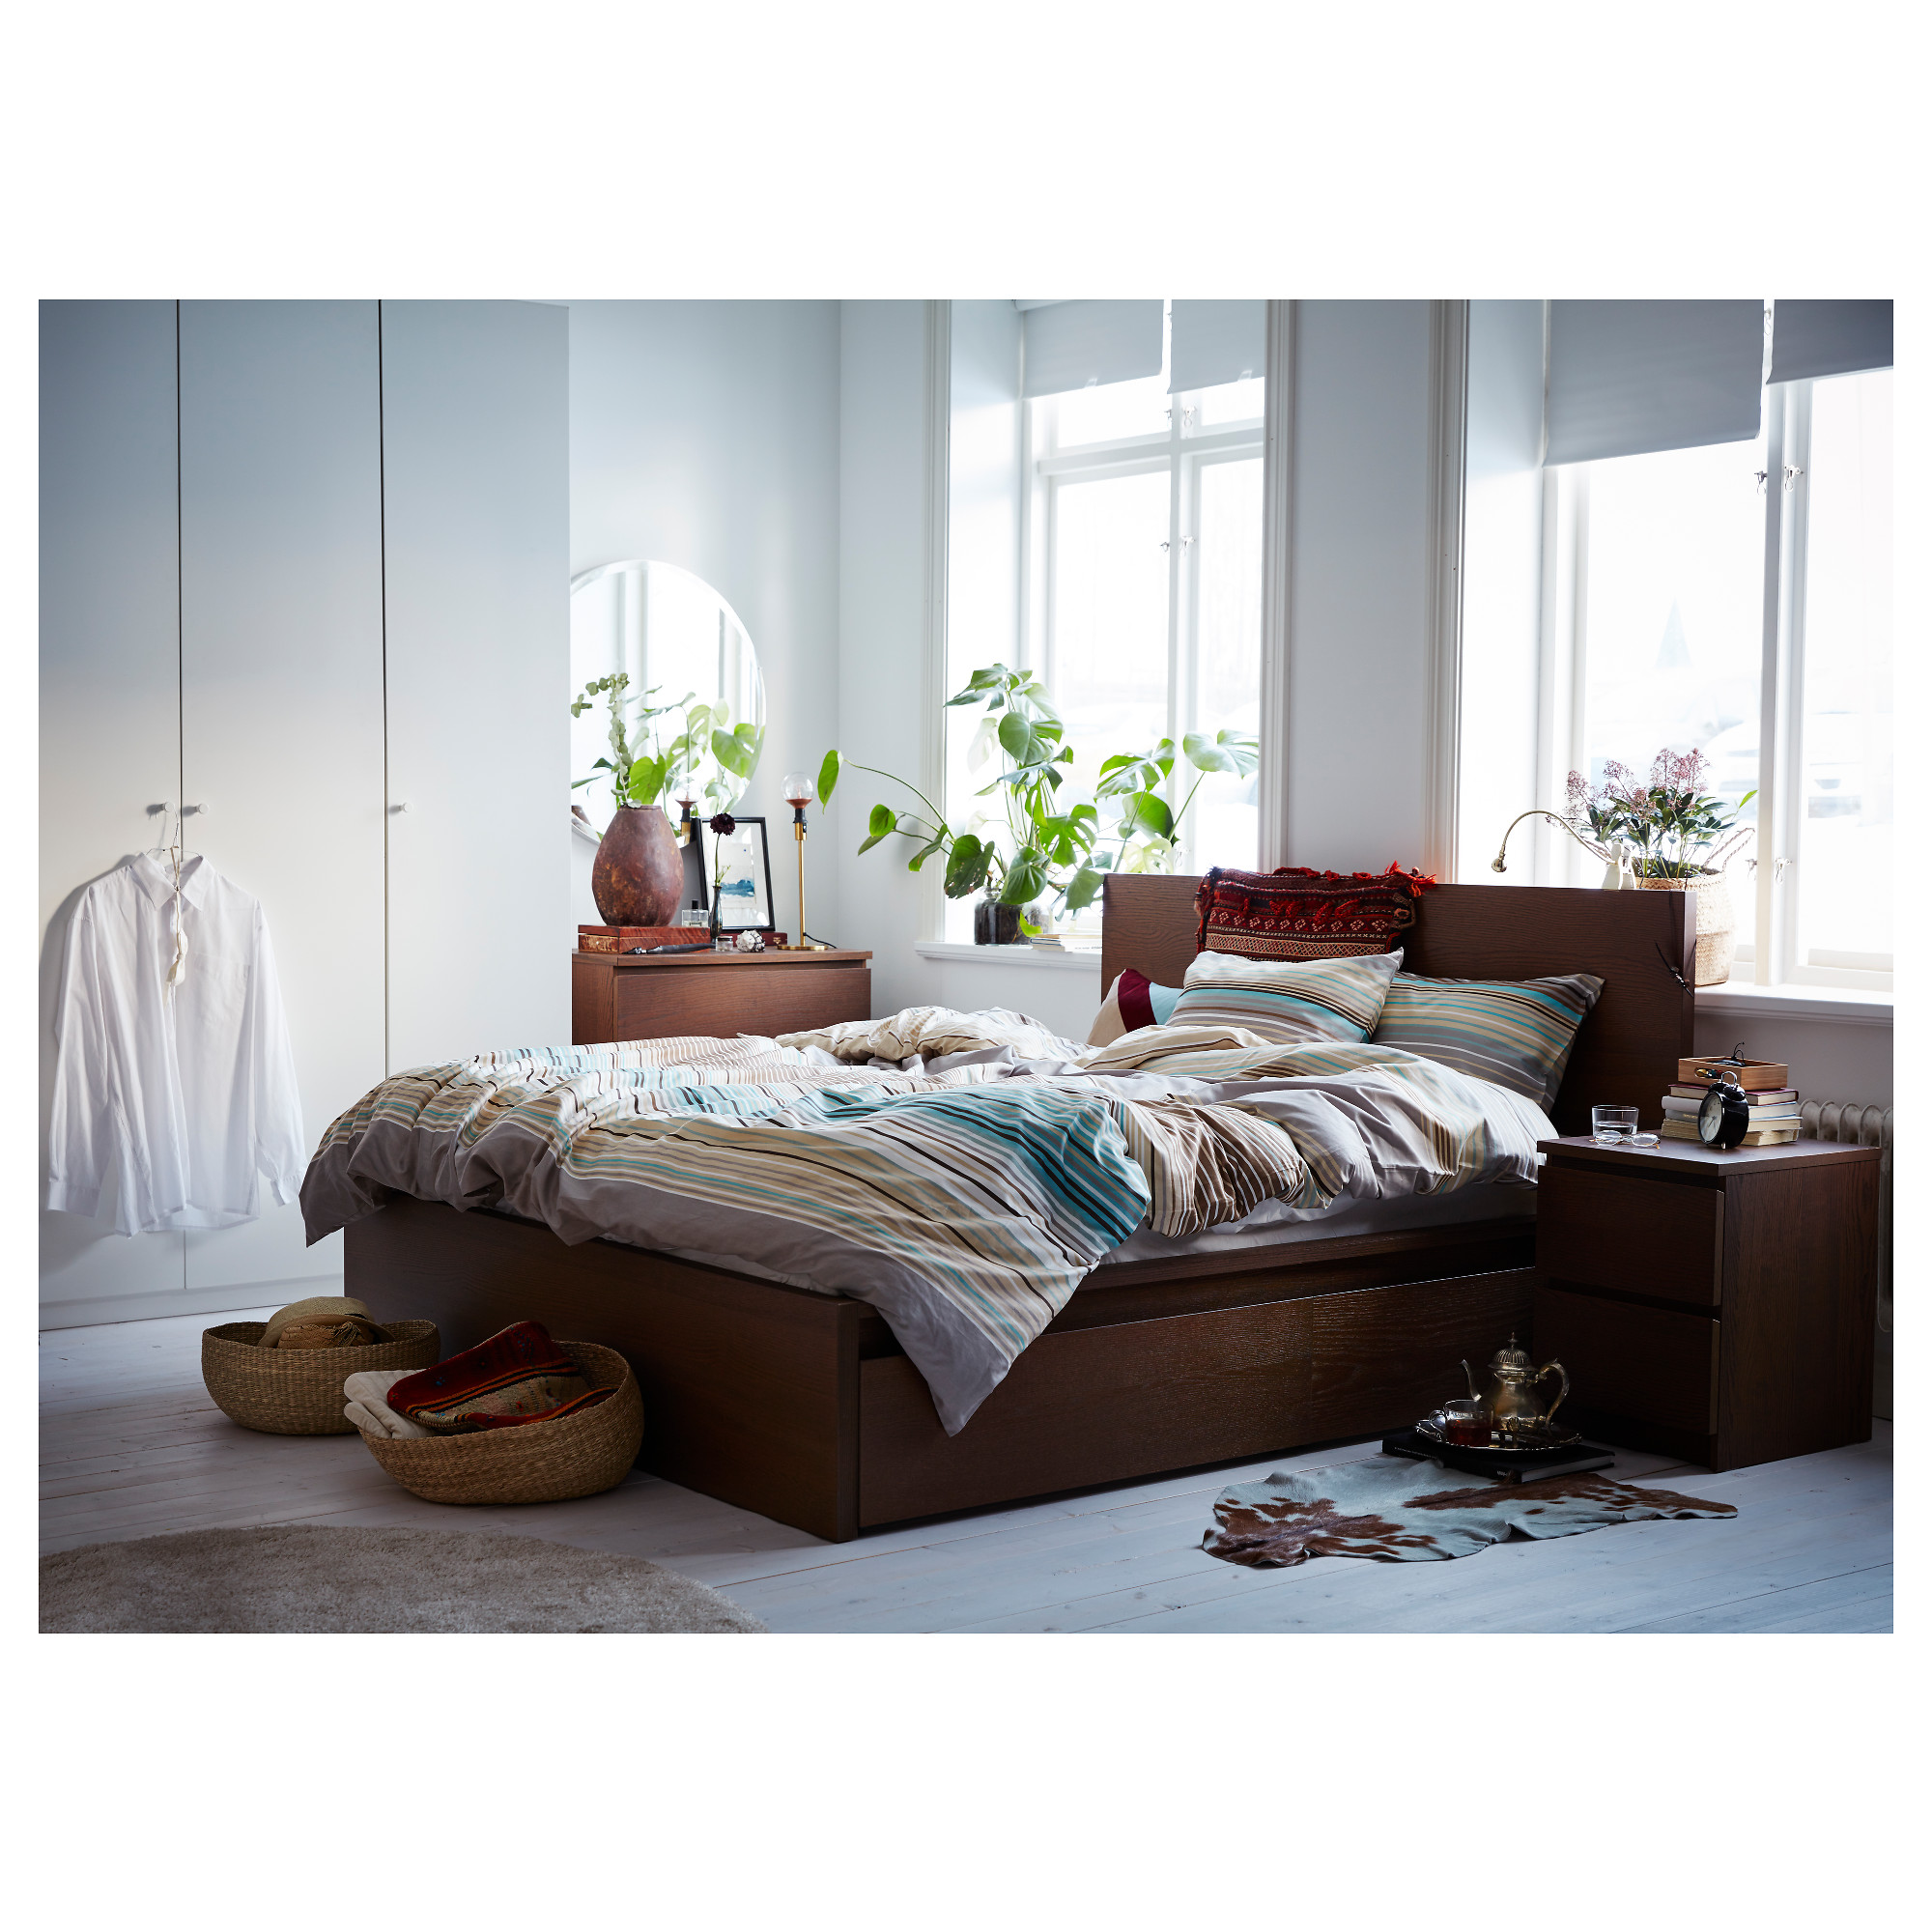 Genial IKEA Lithuania   Shop For Furniture, Lighting, Home Accessories U0026 More